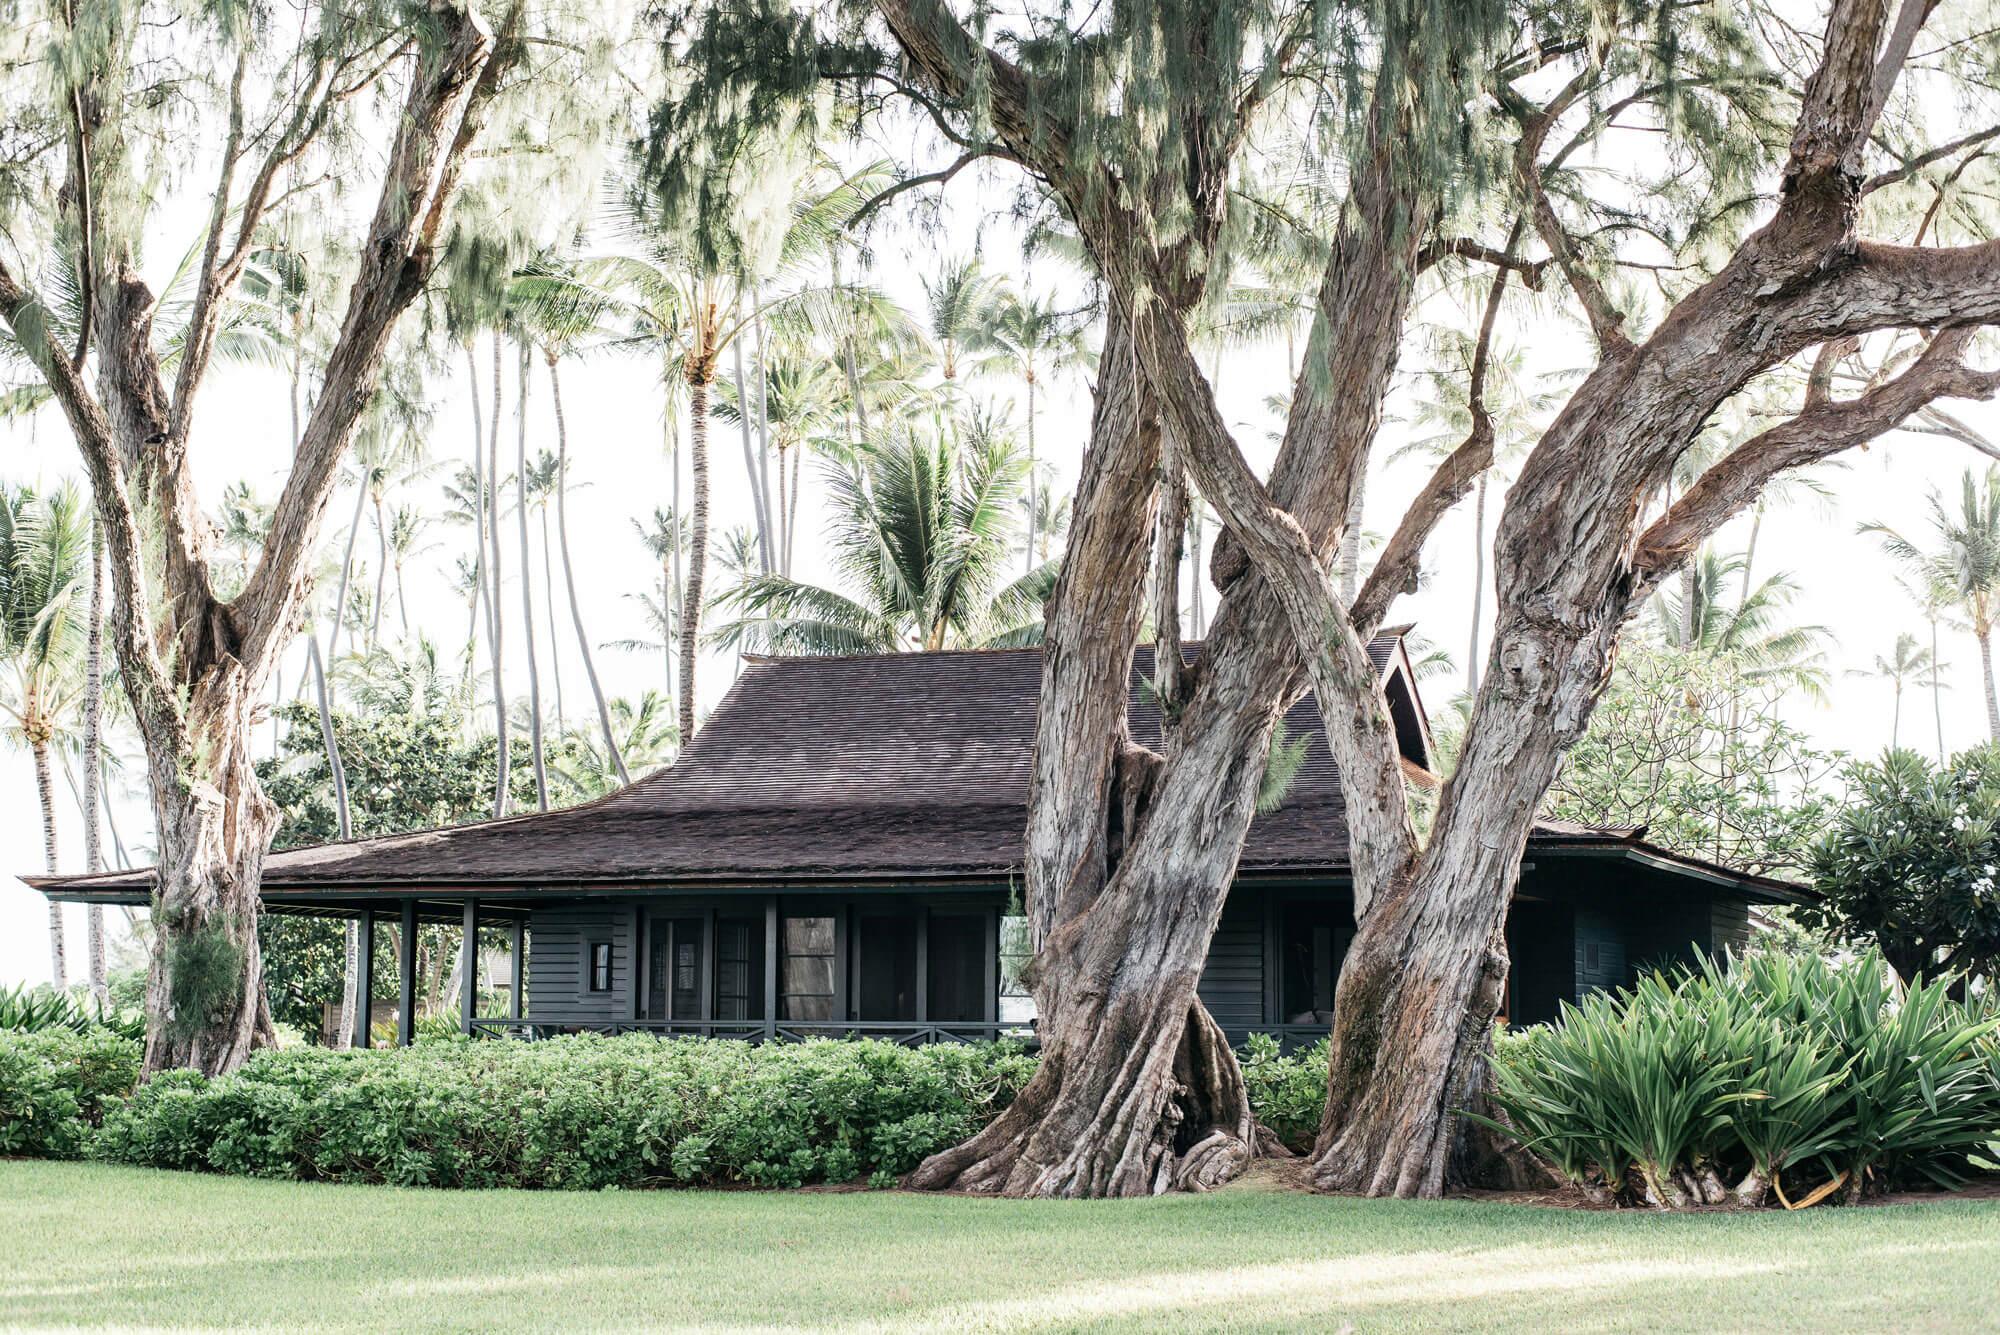 maui beach cottage george hensler rh georgehensler com maui beach homes for rent maui beach homes vacation rental